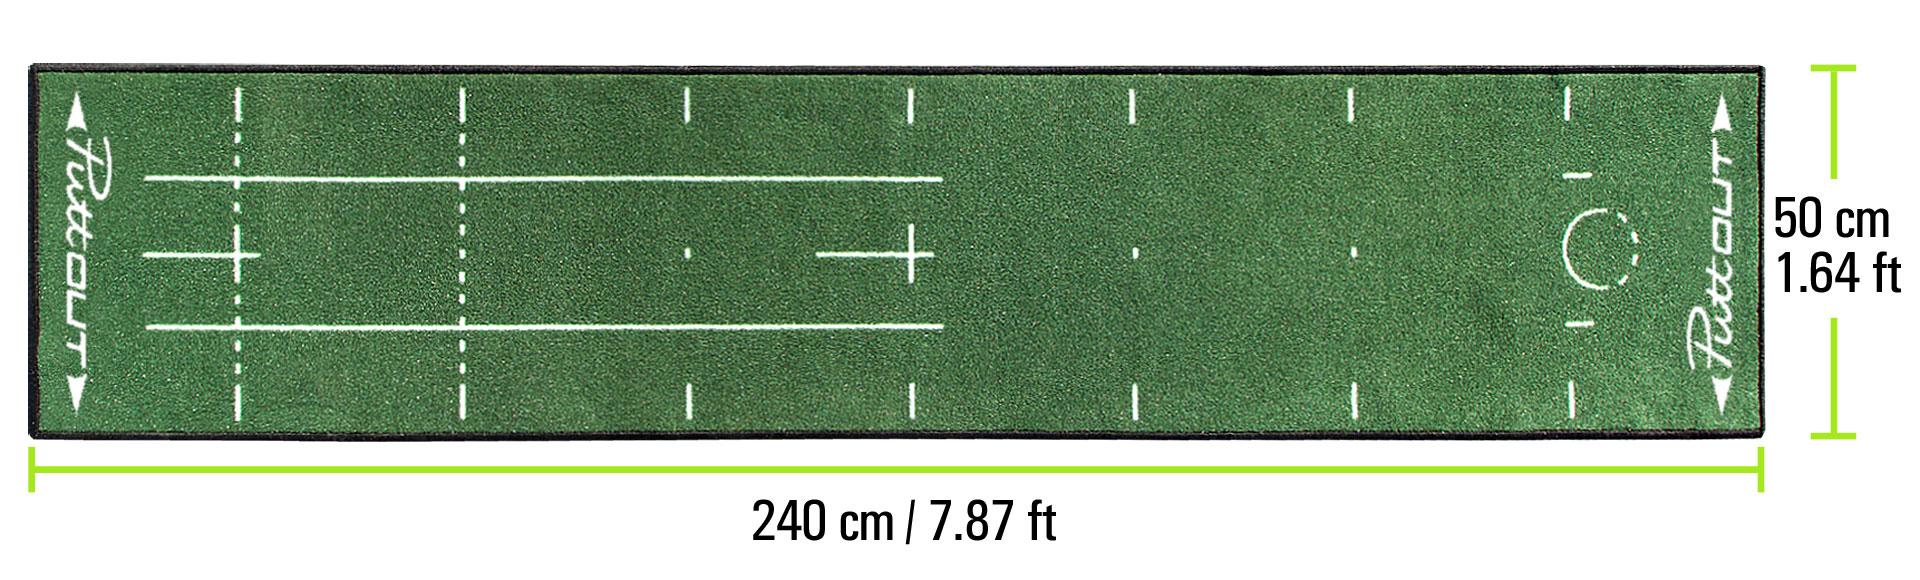 PuttOUT Mat Dimensions Green